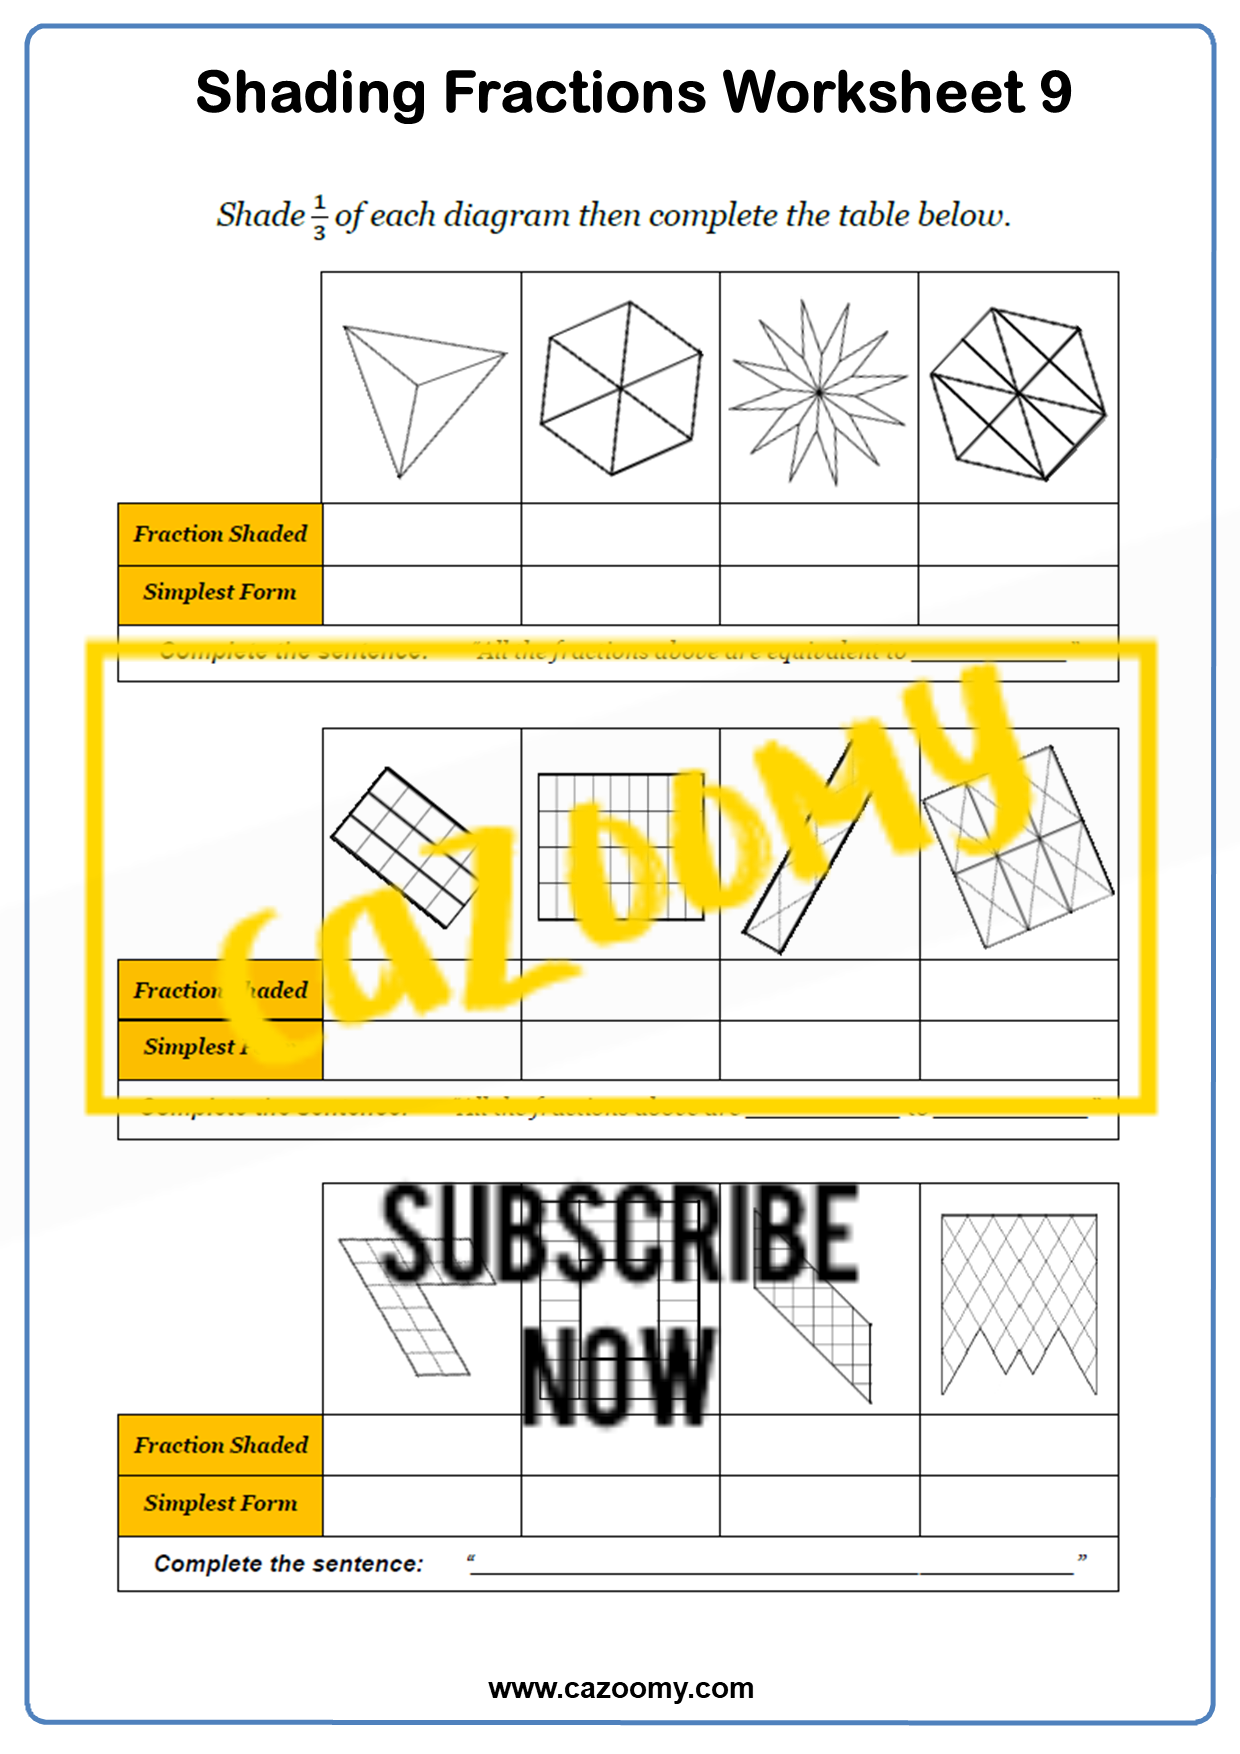 Shading Fractions Worksheet 3